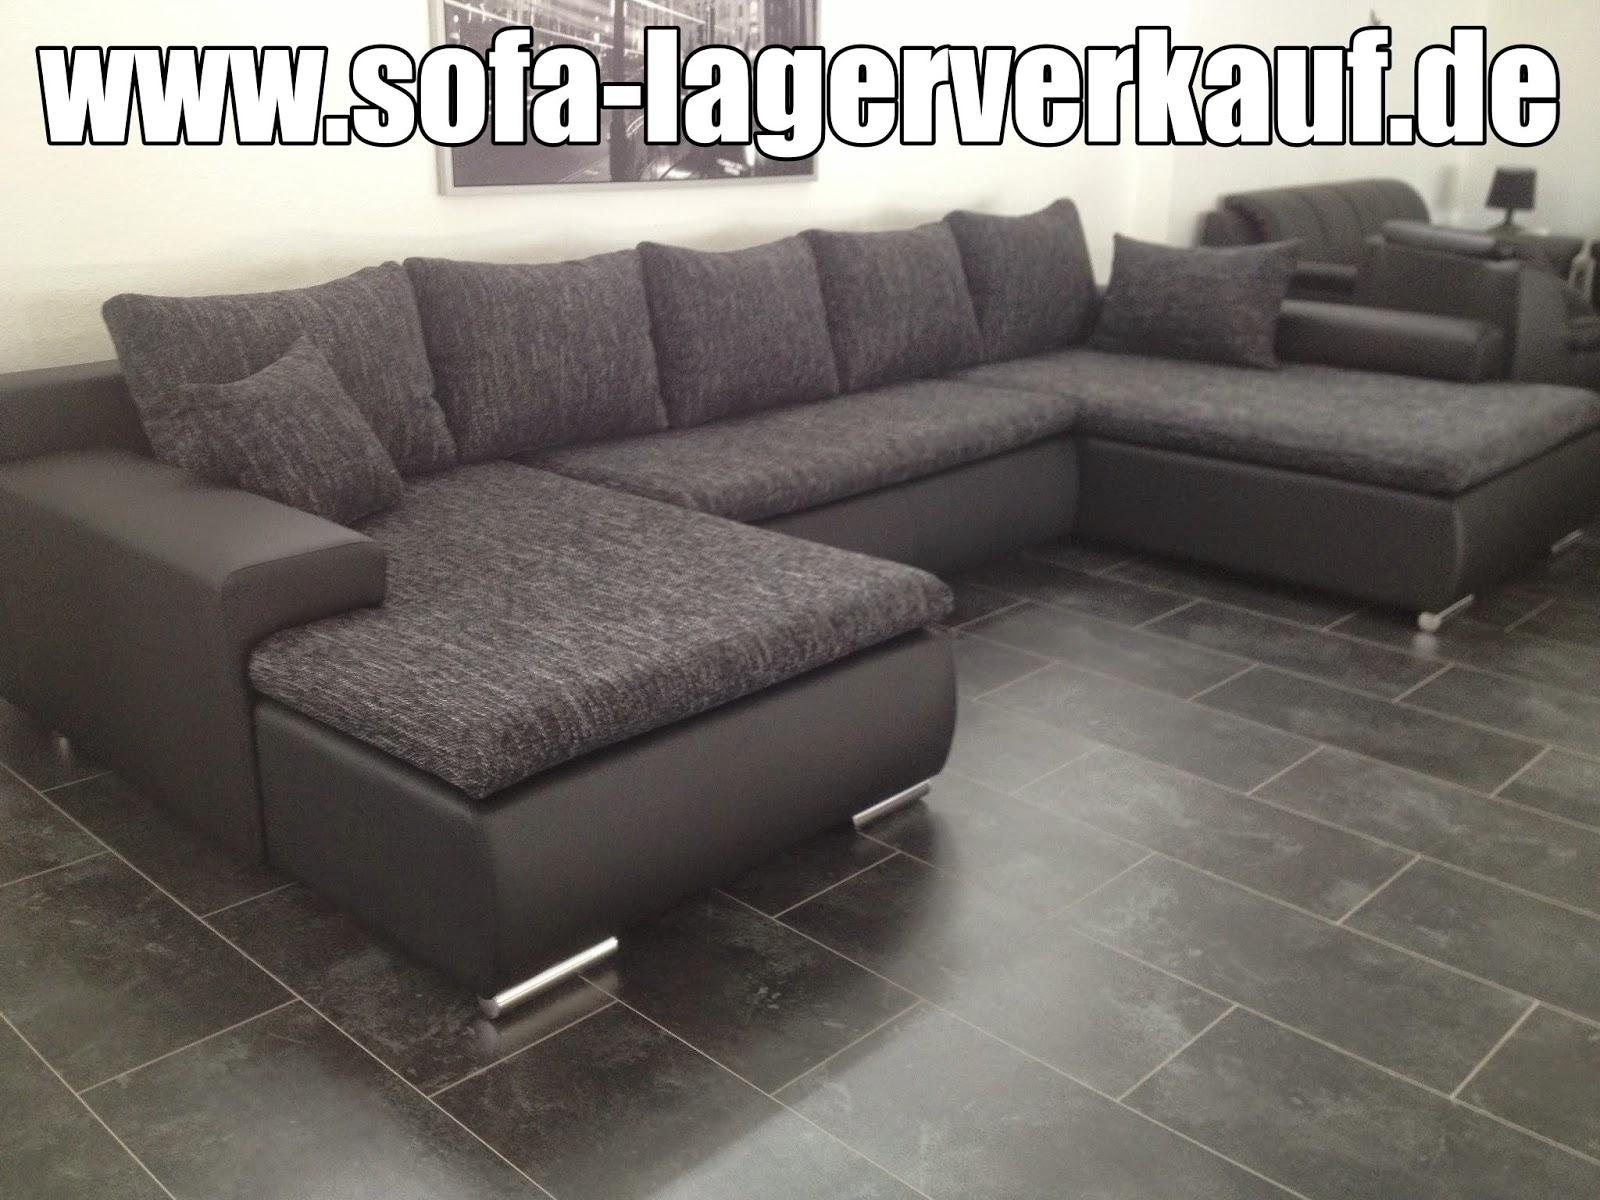 www.xl-sofa.de: www.sofa-lagerverkauf.de # Sofa # Couch ...